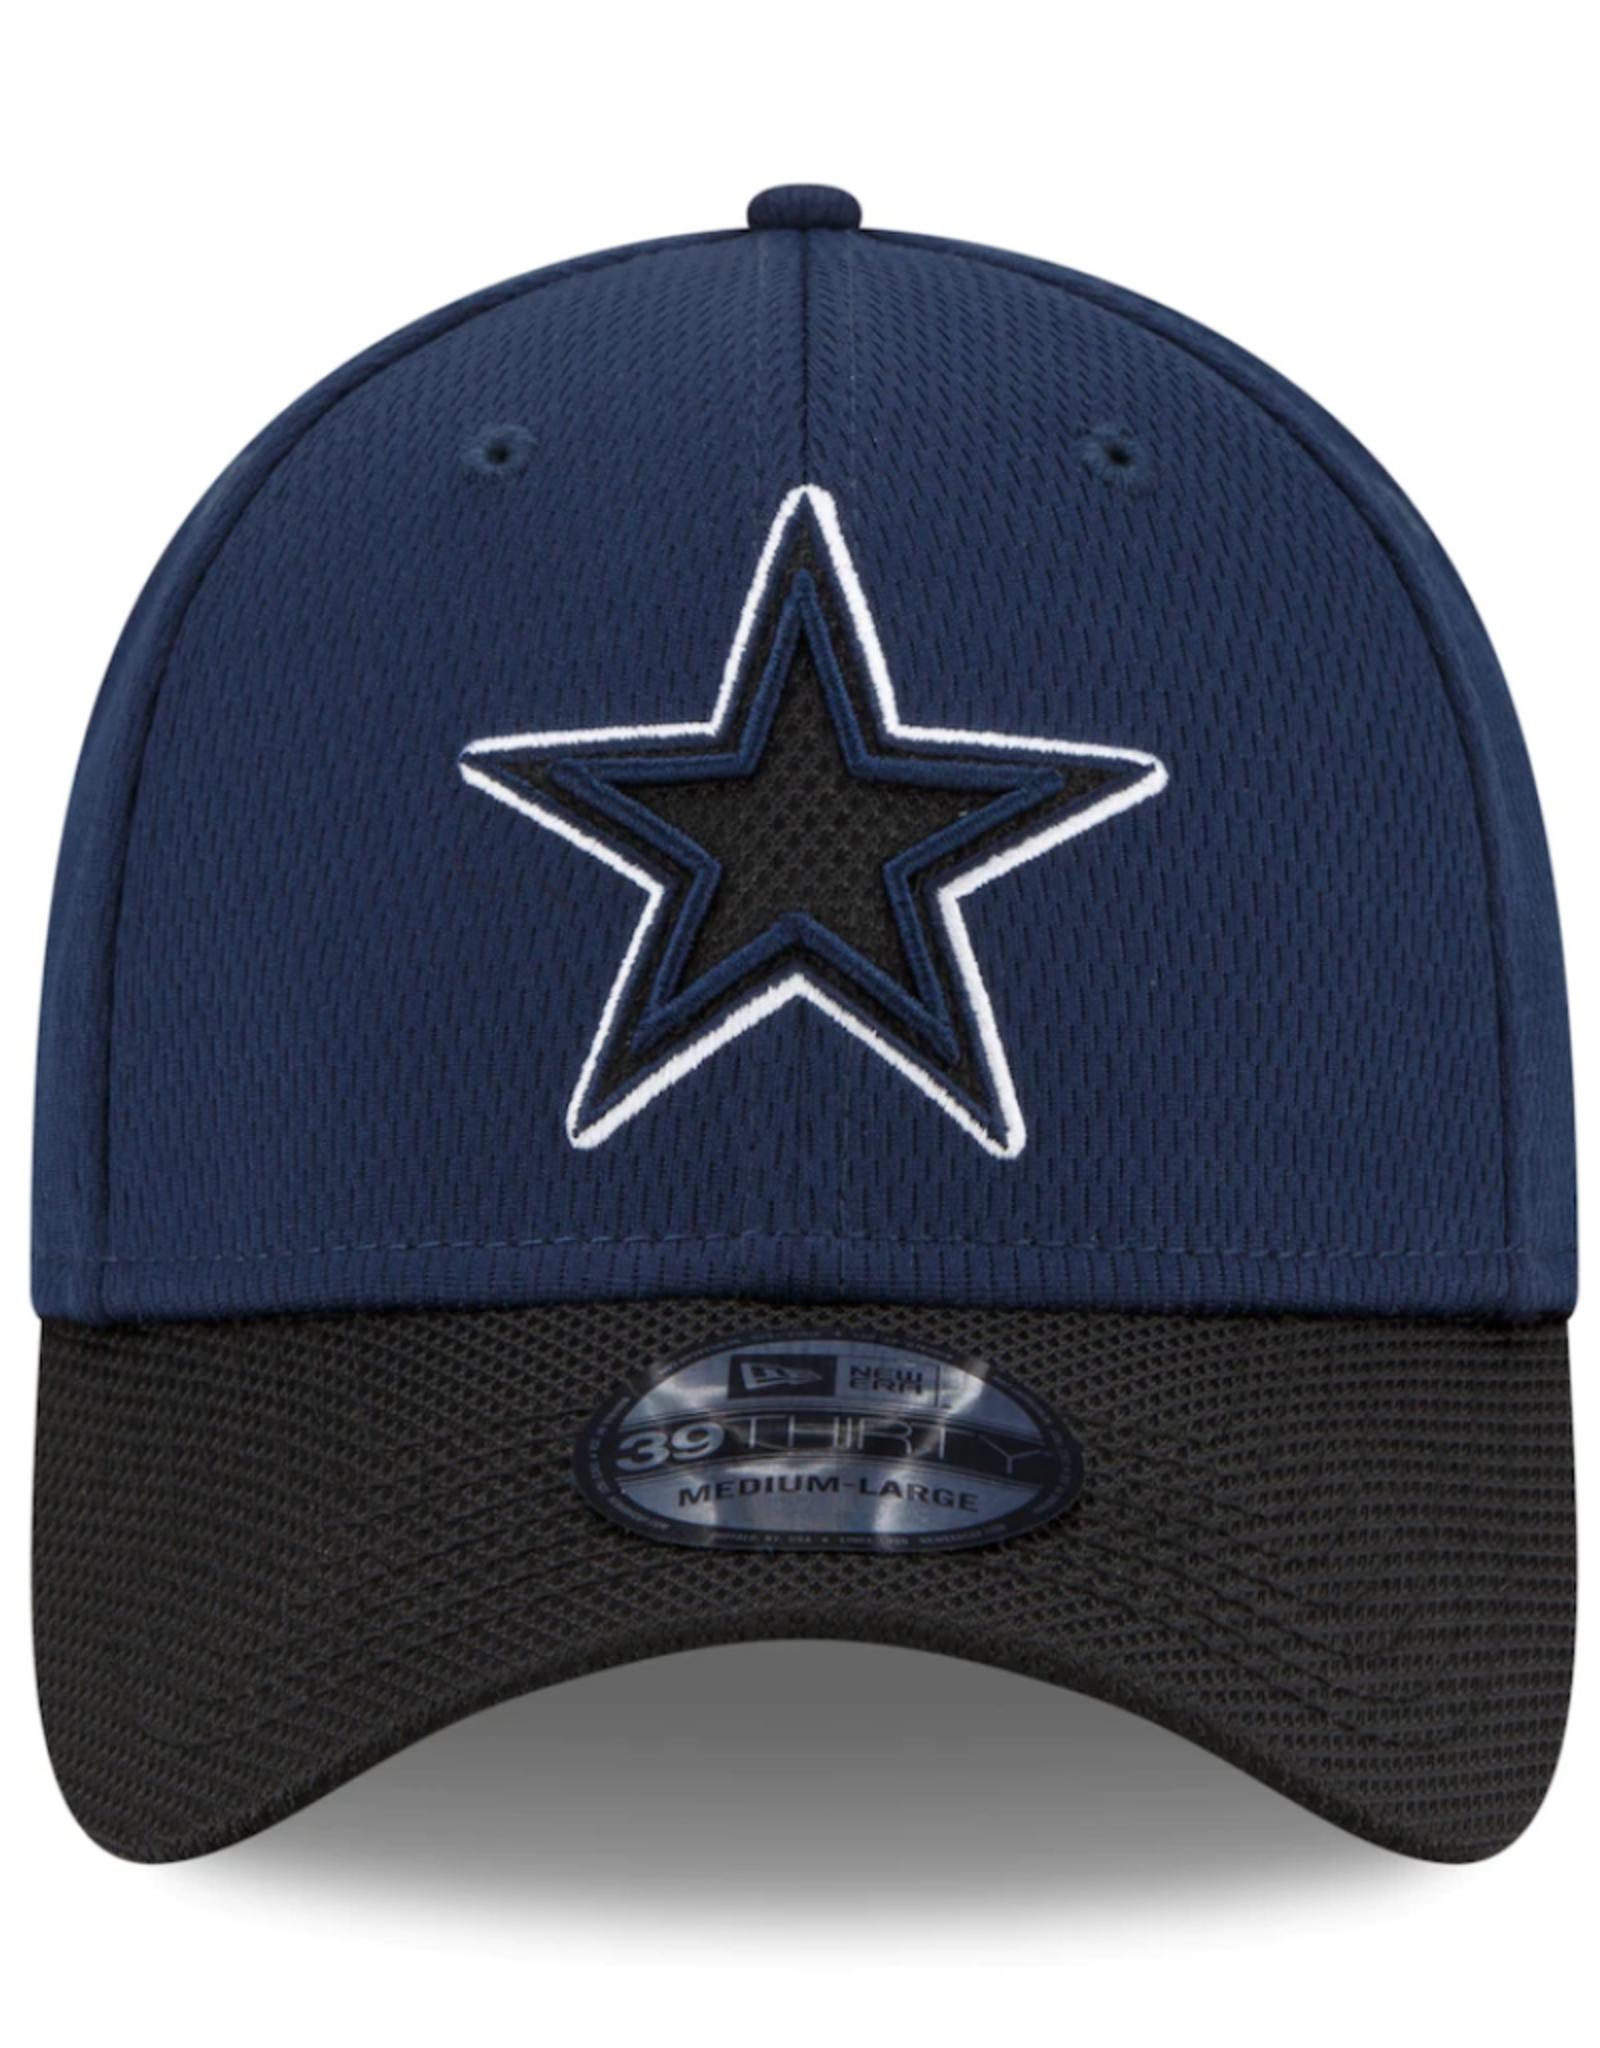 New Era '21 Sideline Road 39THIRTY Dallas Cowboys Navy